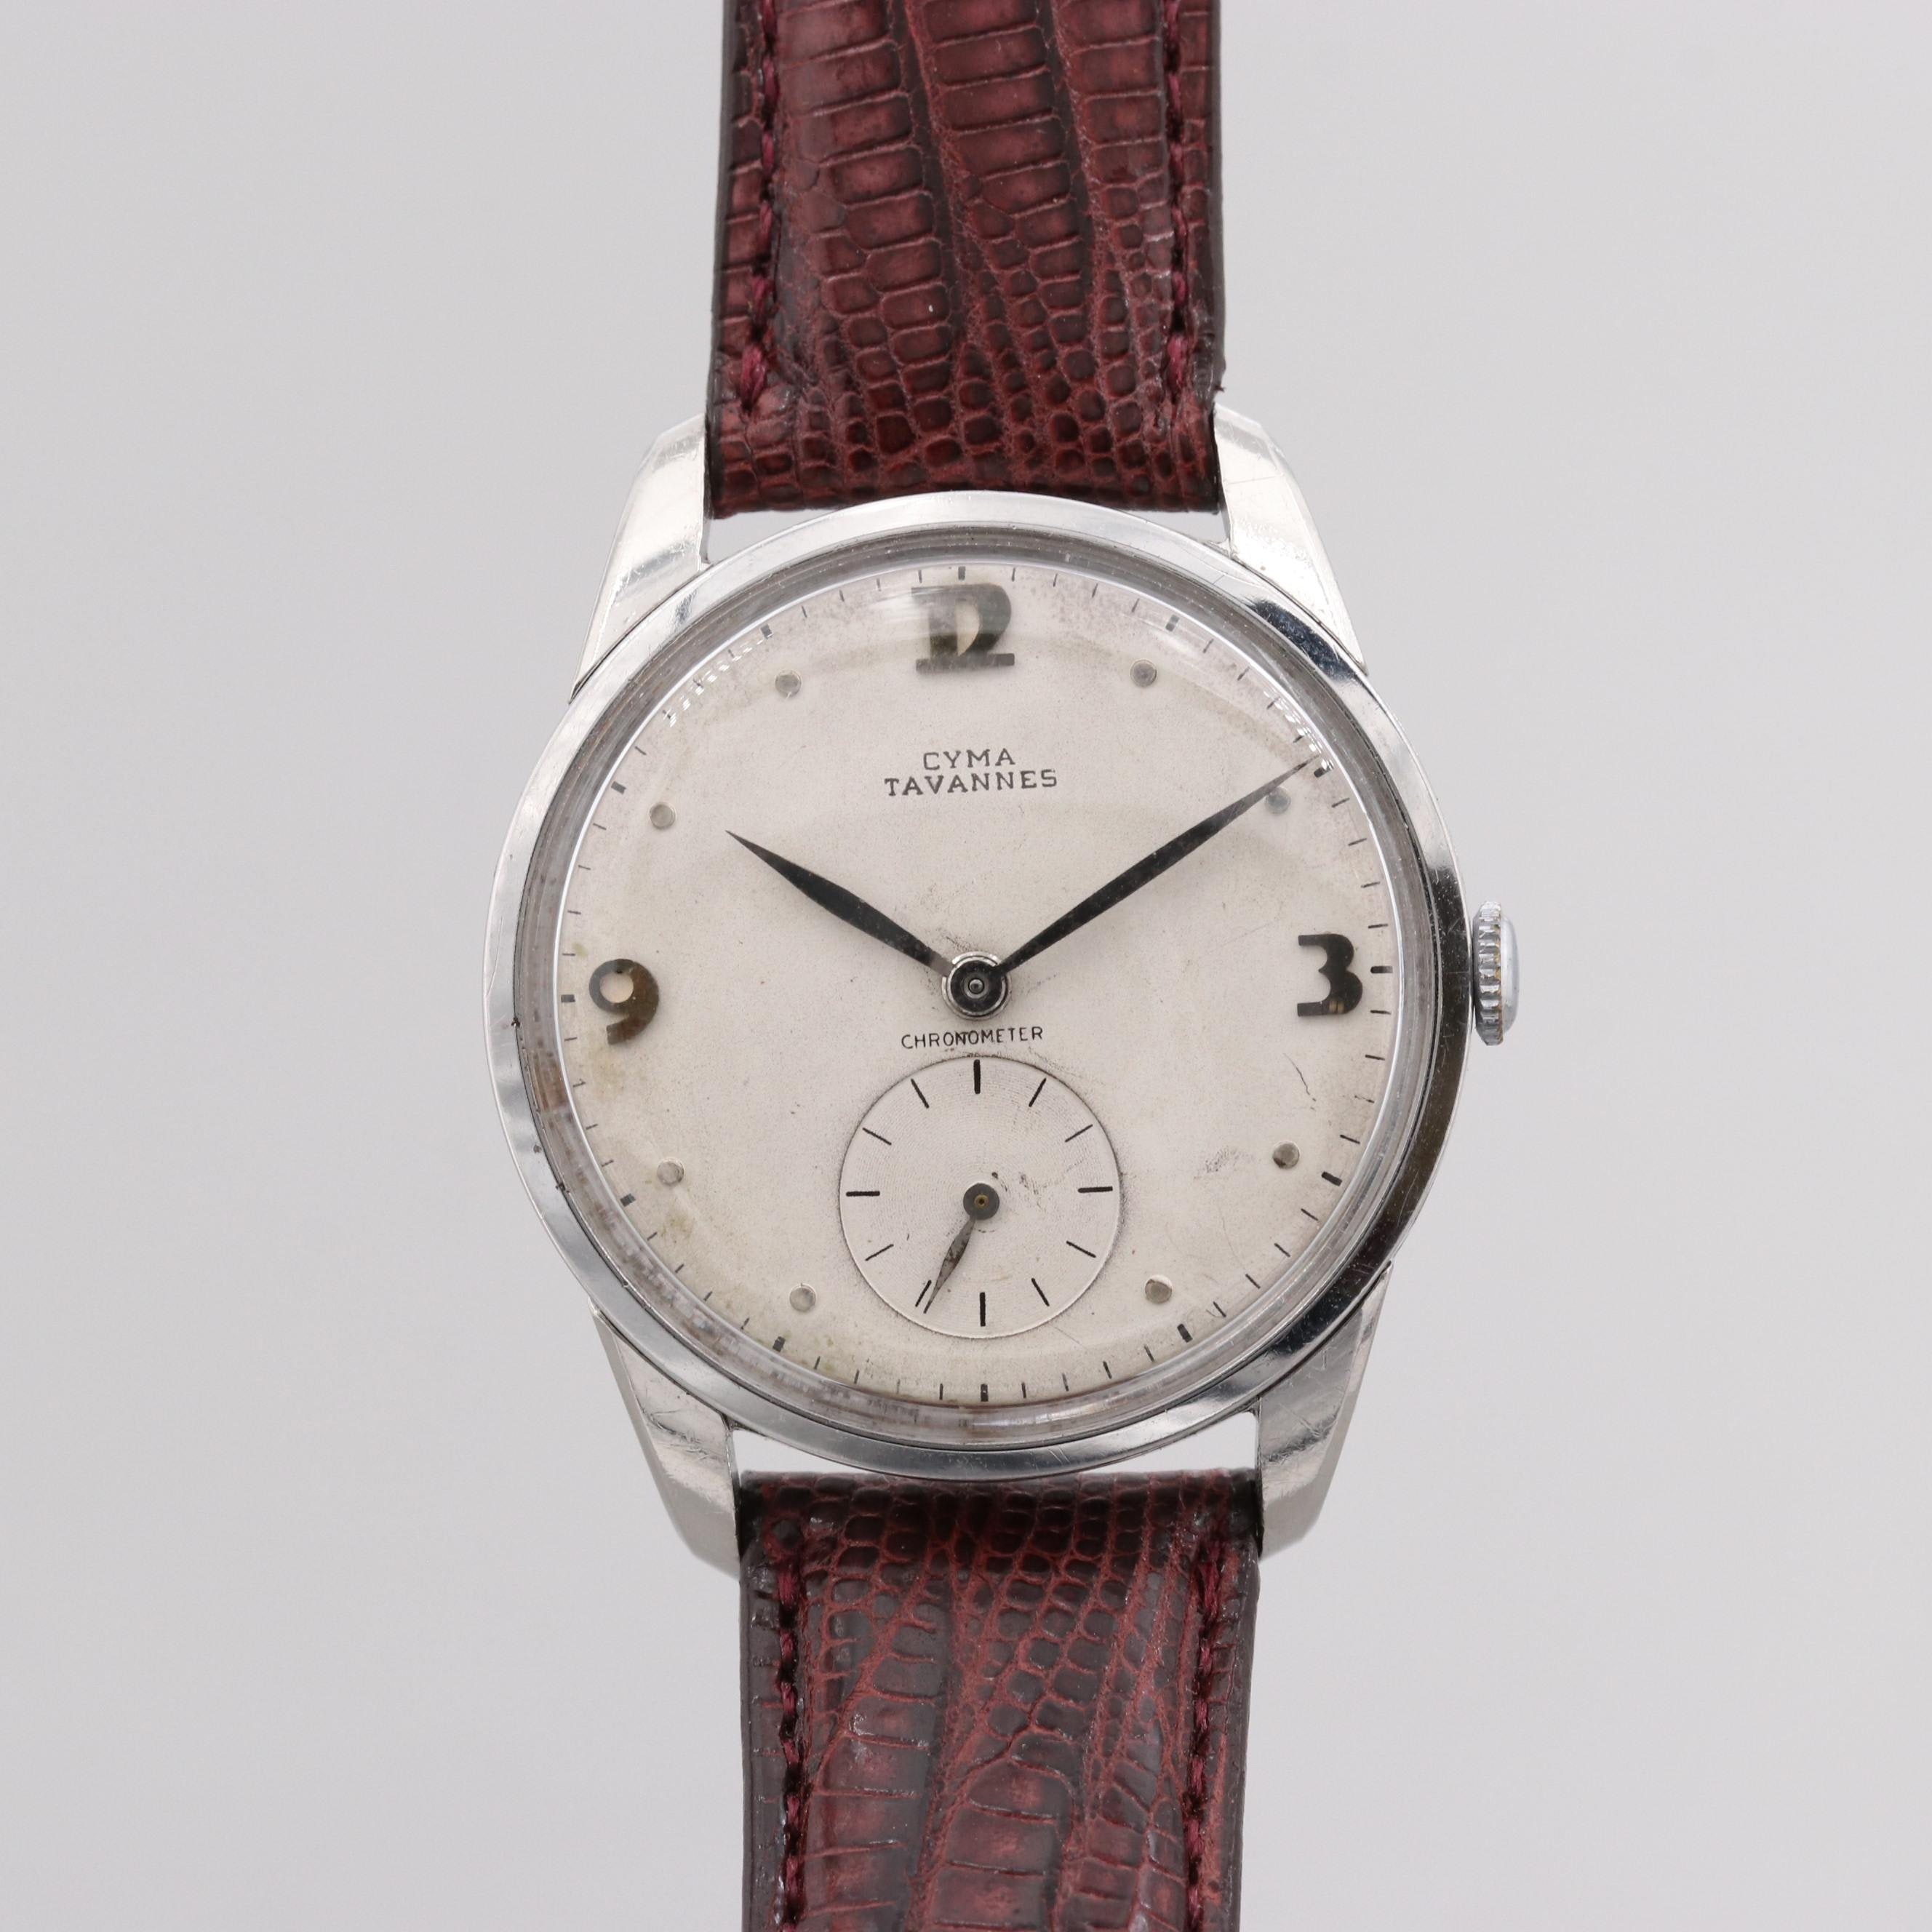 Vintage Cyma Tavannes Stainless Steel Stem Wind Wristwatch